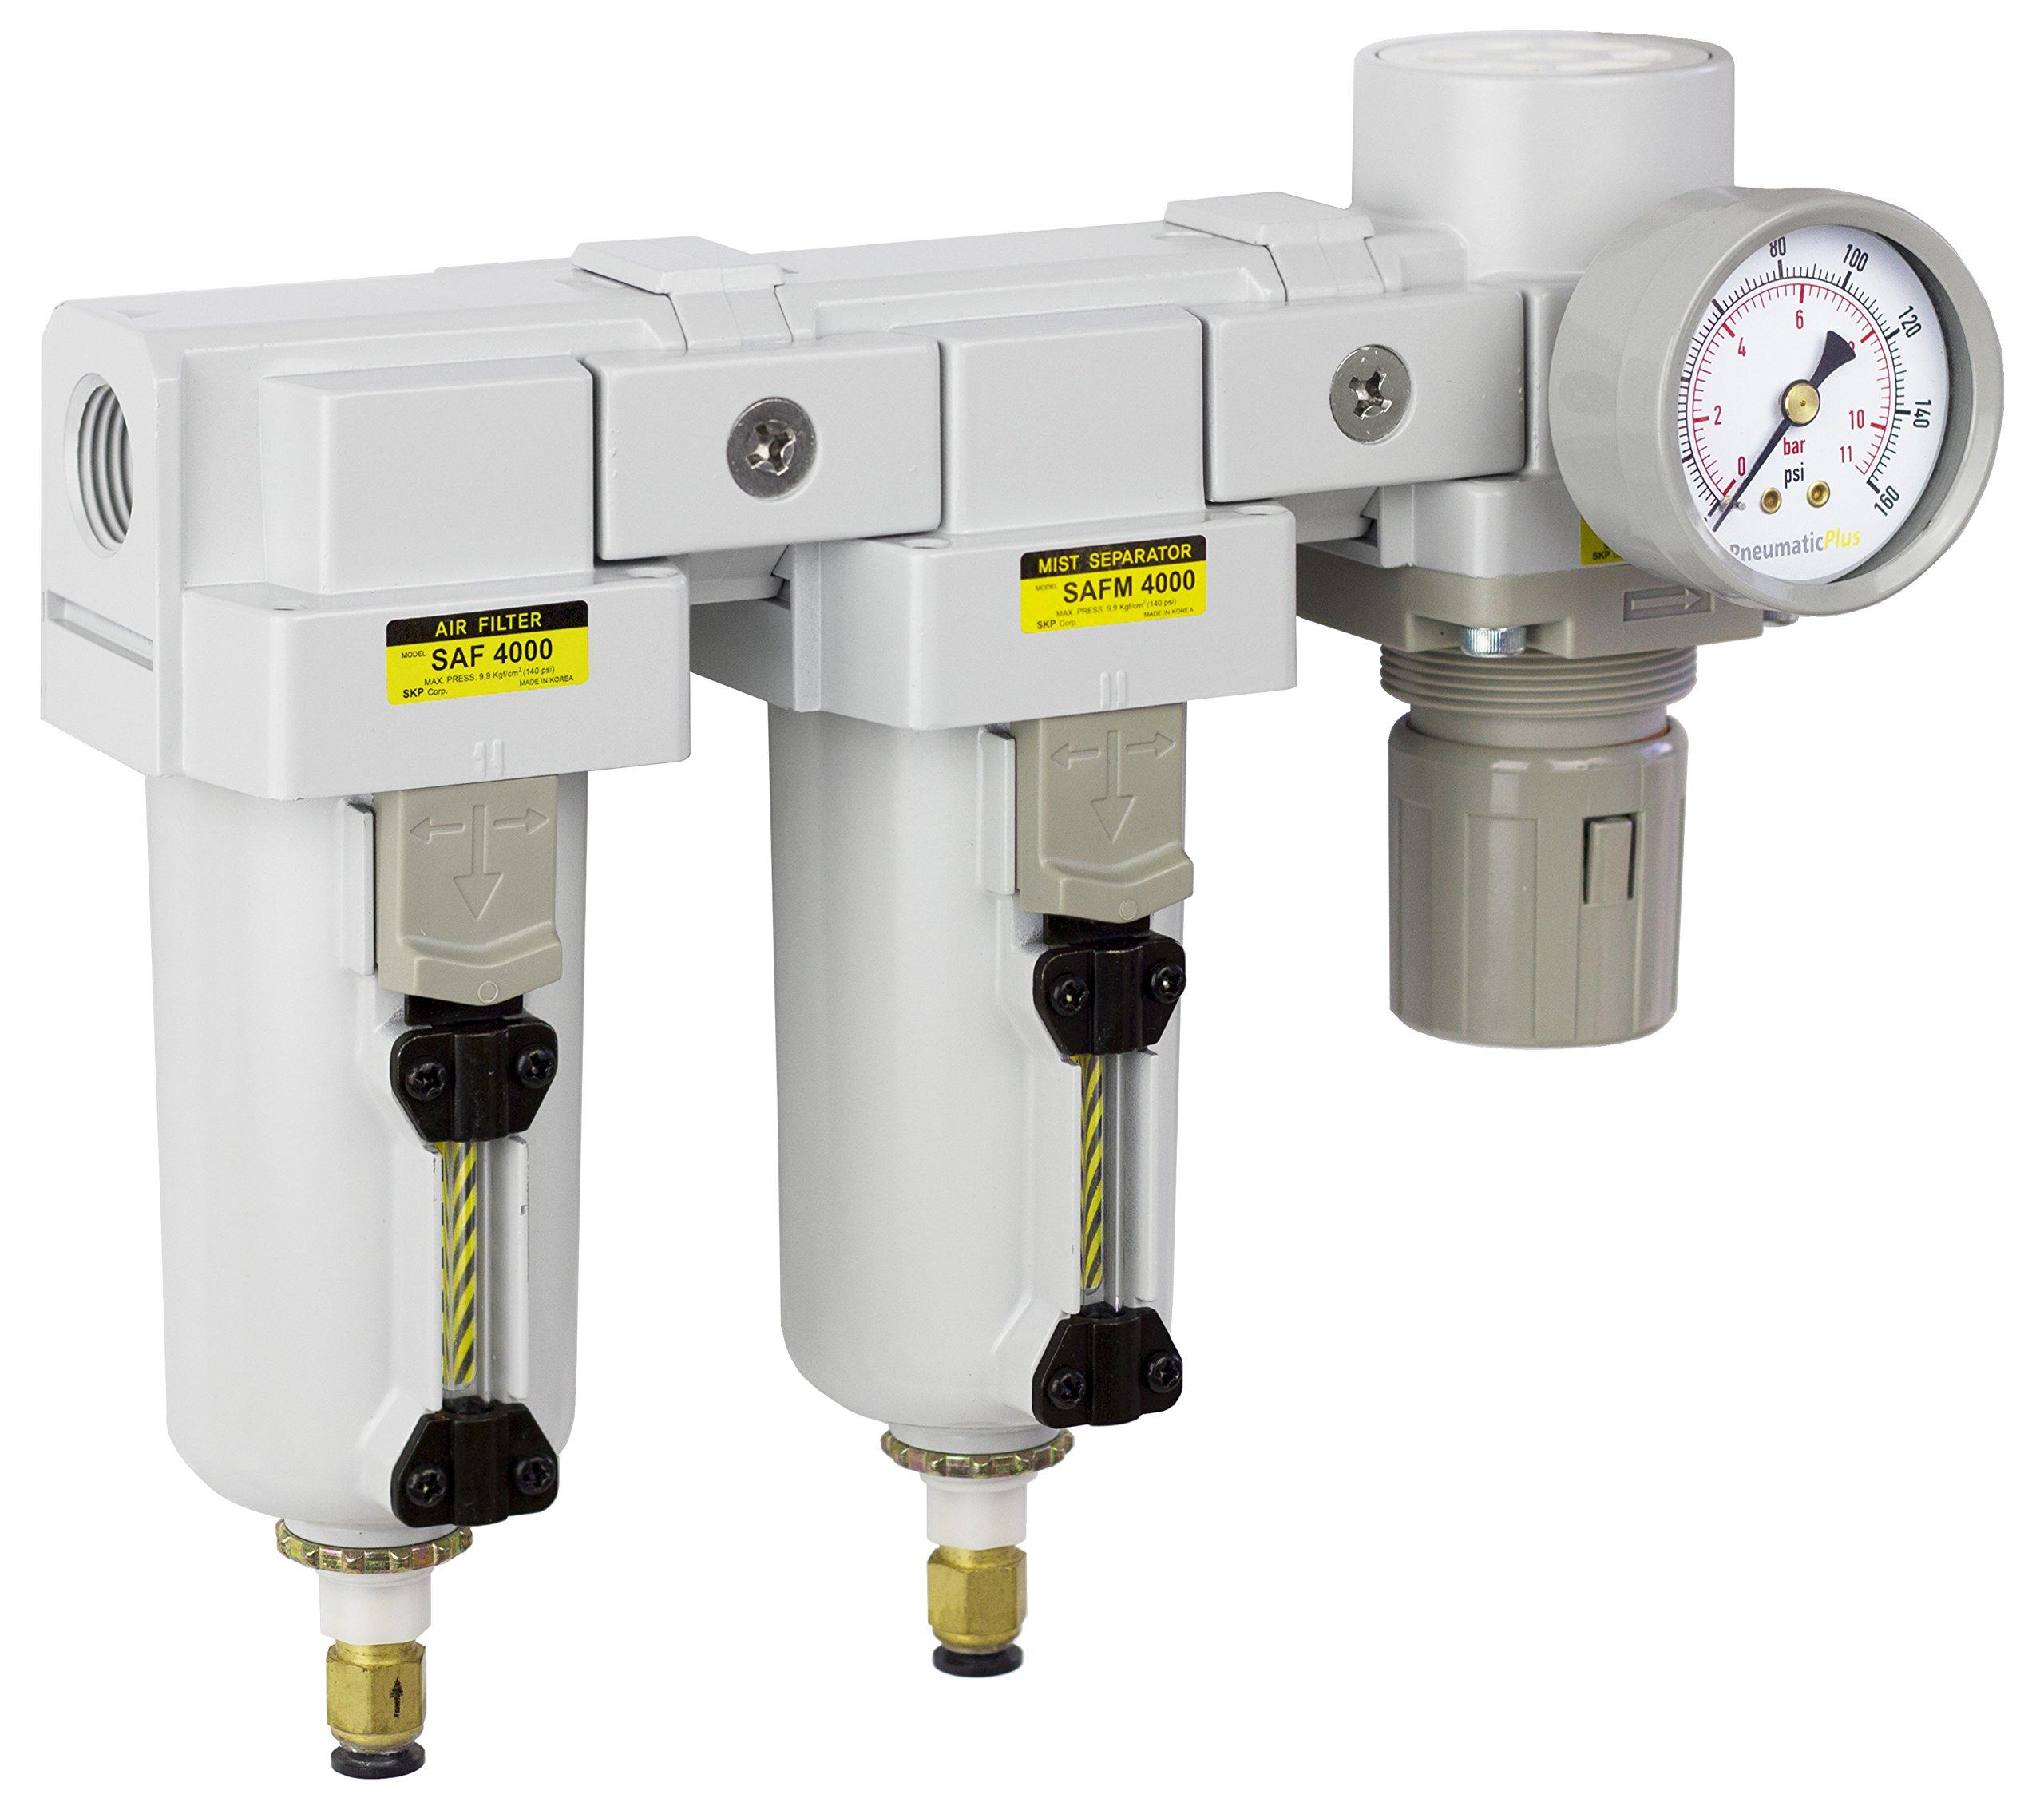 PneumaticPlus SAU4030M-N04DG-MEP Three Stage Air Drying System - Air Particulate Filter, 0.3 Micron Coalescing Filter & Air Pressure Regulator Modular Combo 1/2'' NPT - Auto Drain, Metal Bowl by PneumaticPlus